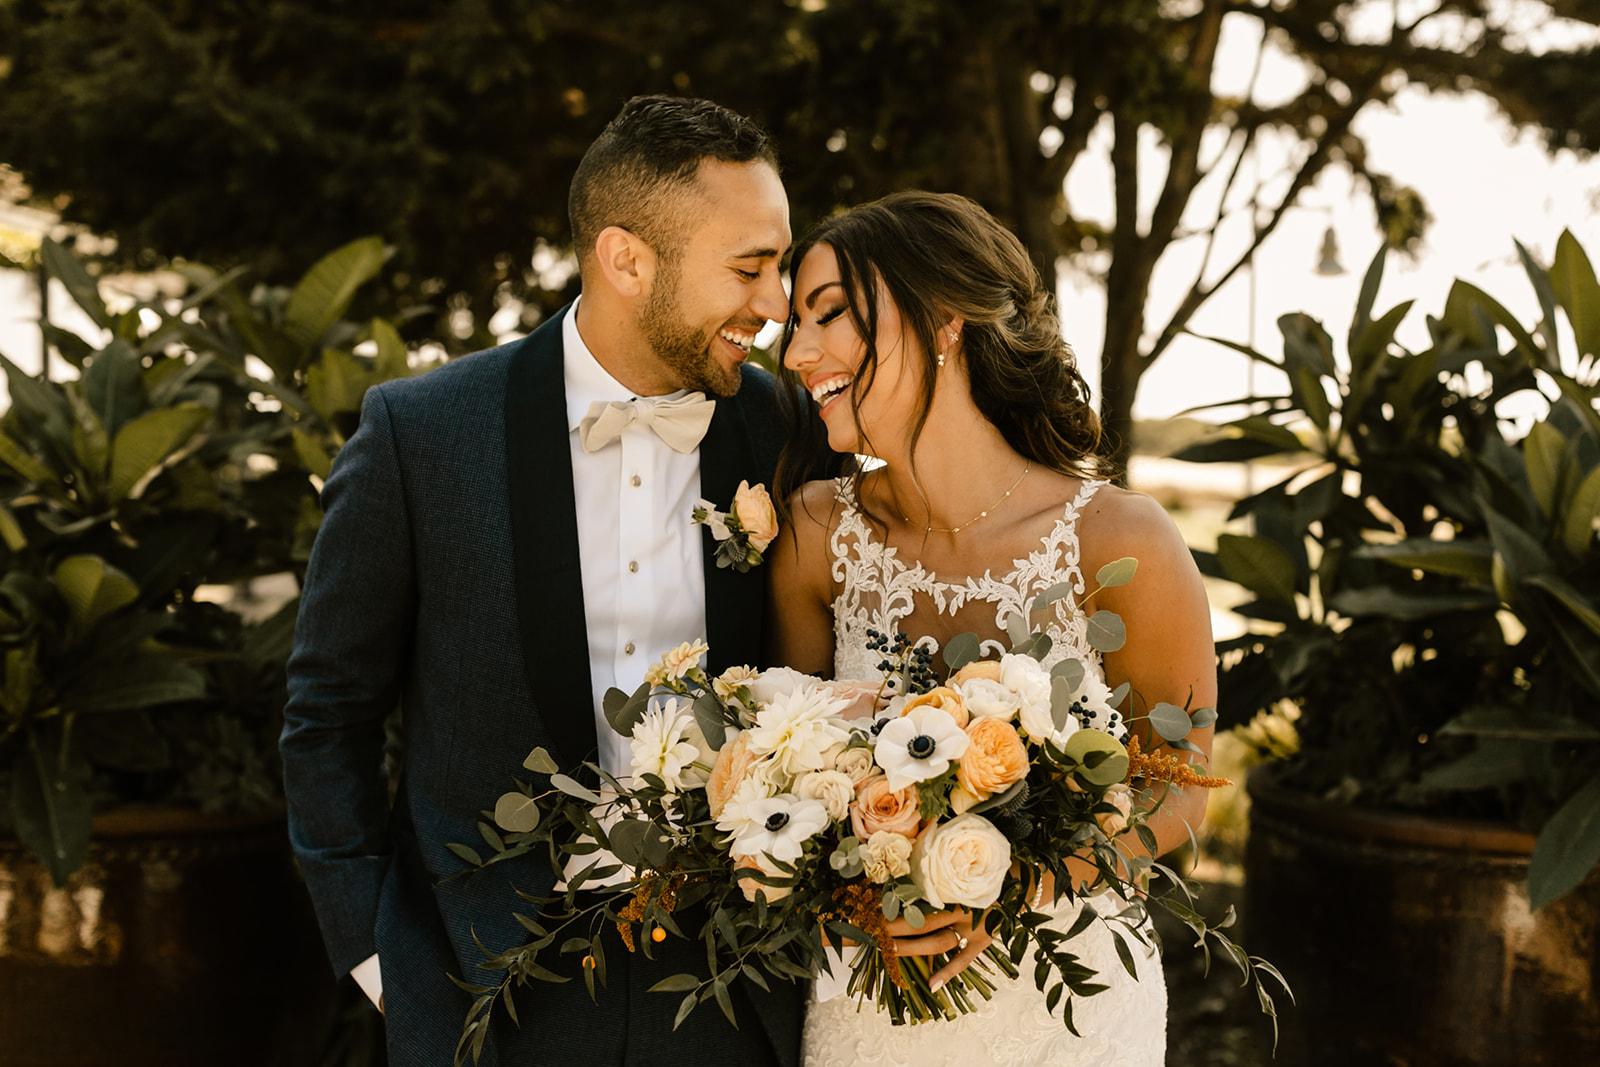 candid wedding photographer Seattle, WA